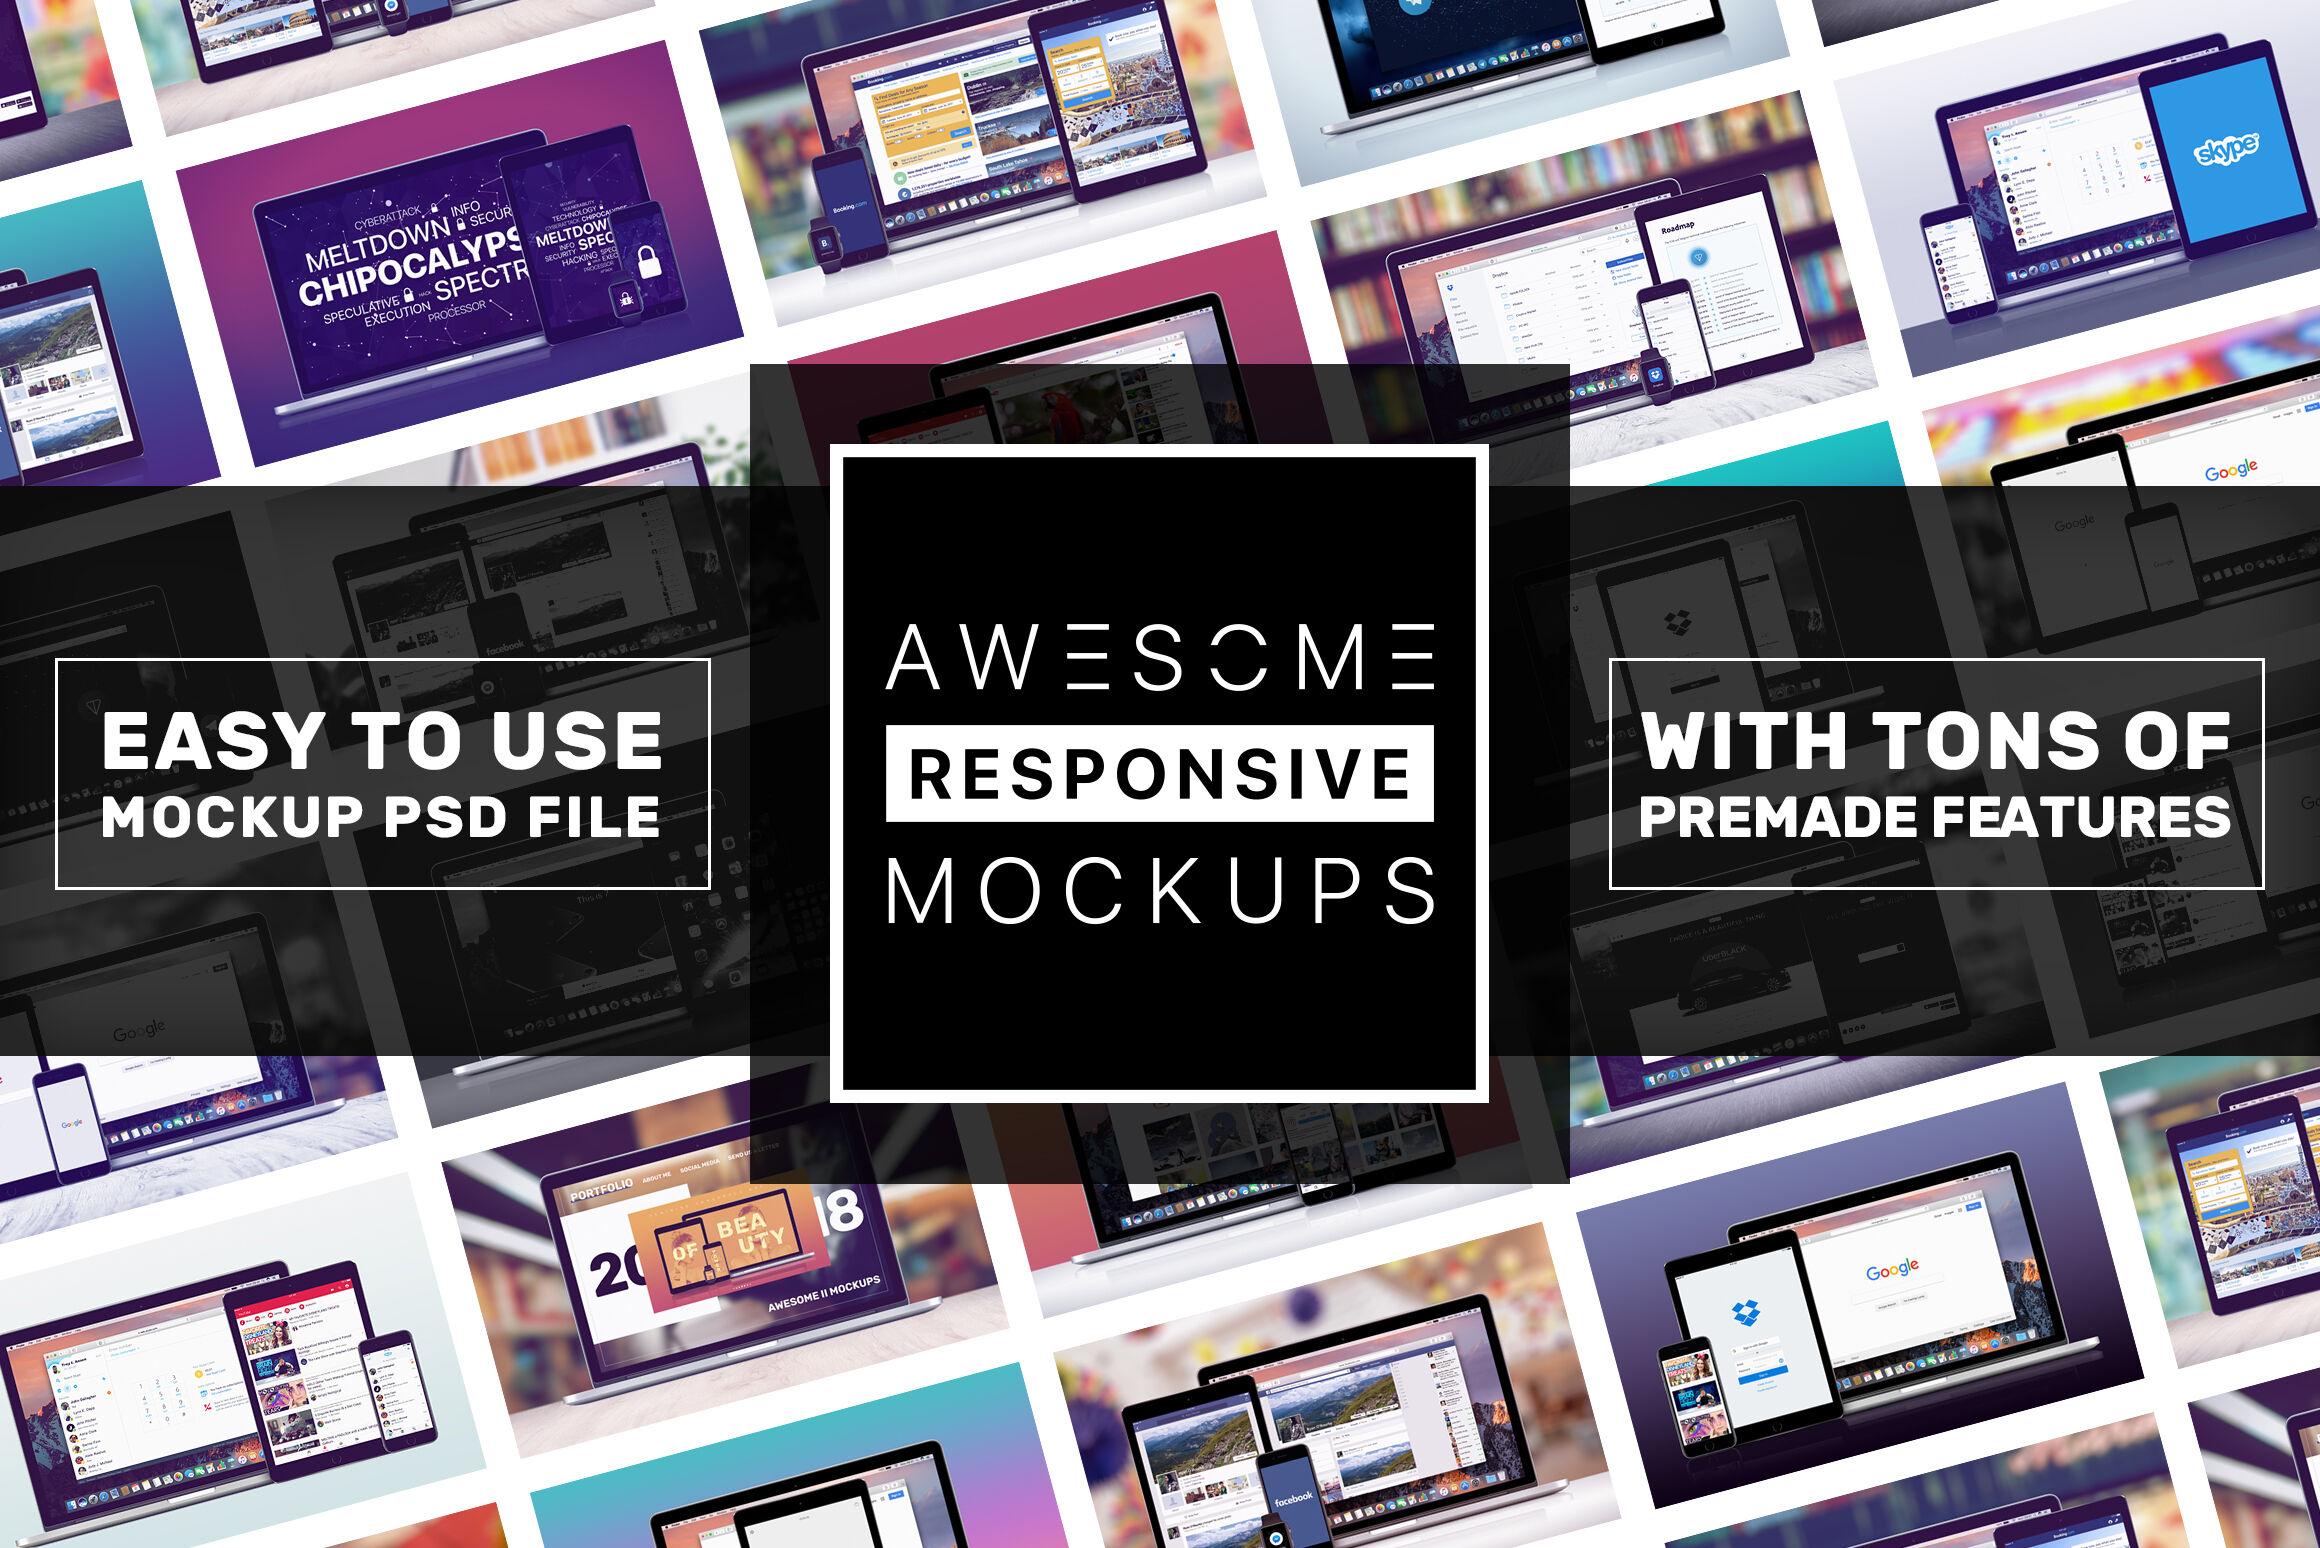 Watch Mockup Psd Free Download